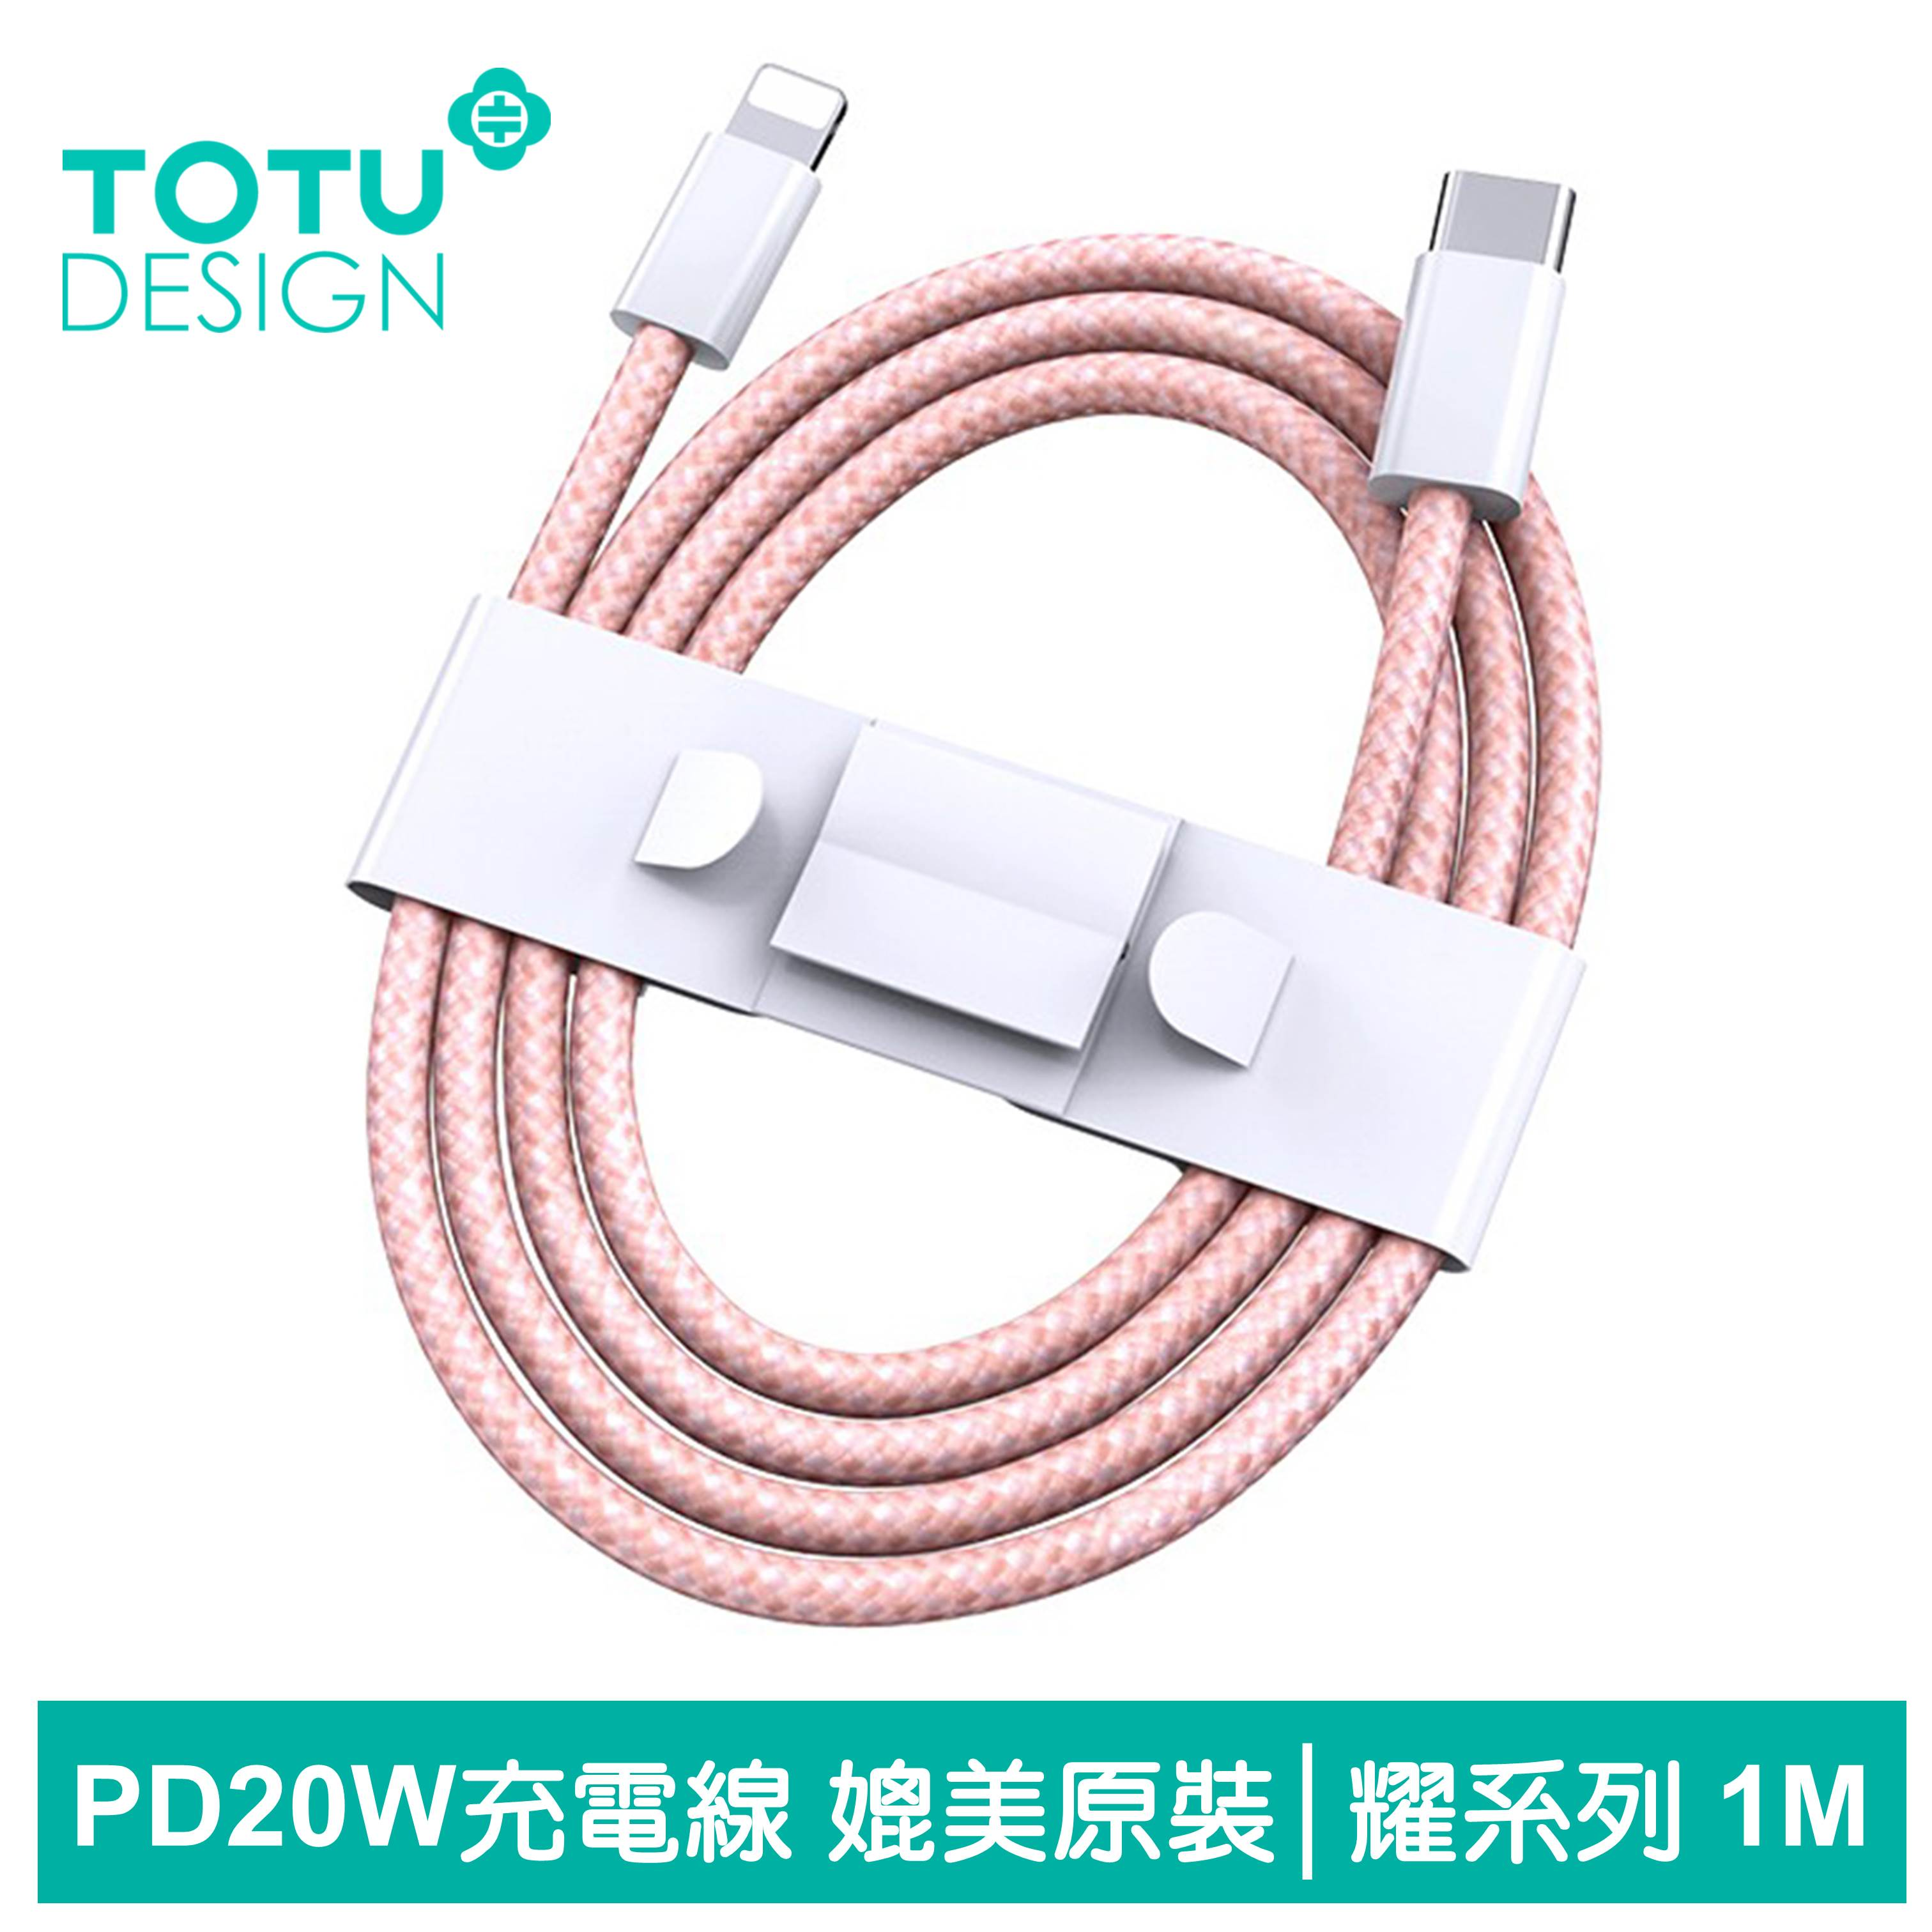 TOTU台灣官方 PD/Lightning/Type-C/iPhone充電線傳輸線編織快充線 20W 媲美原裝 耀系列 1M 粉色